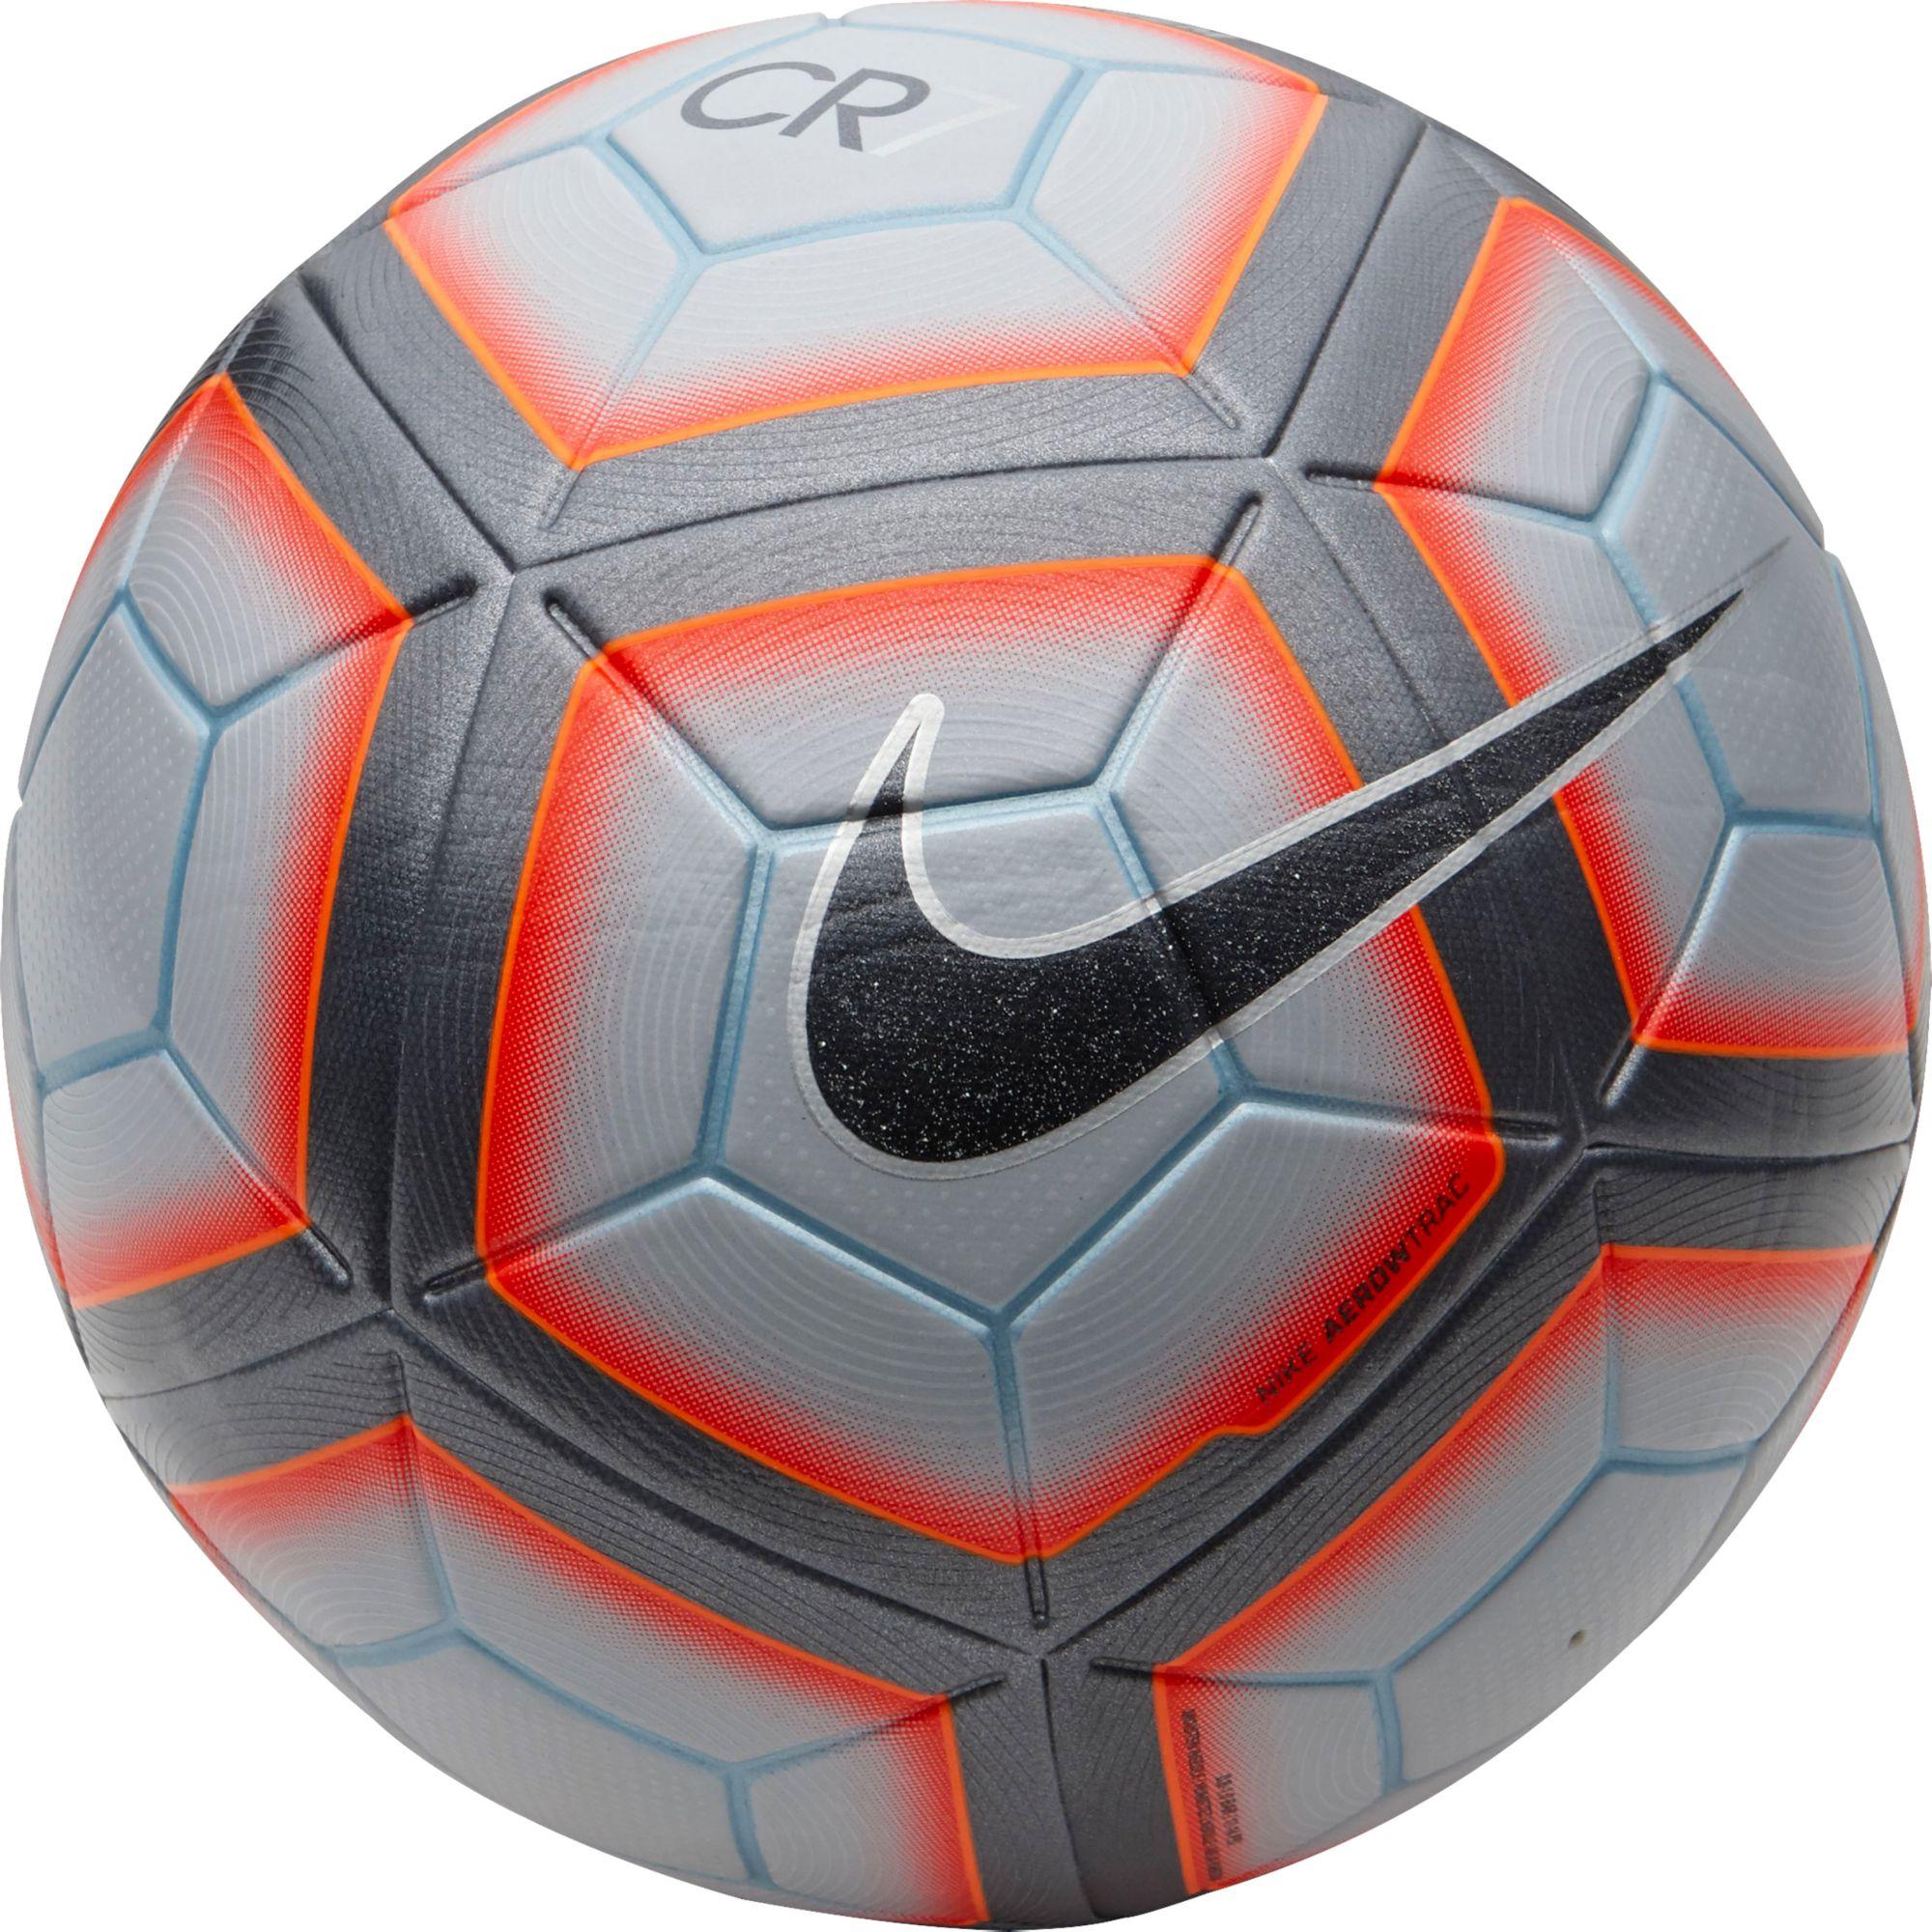 nike ordem 4 cr7 match ball dick sportivo ufficiale